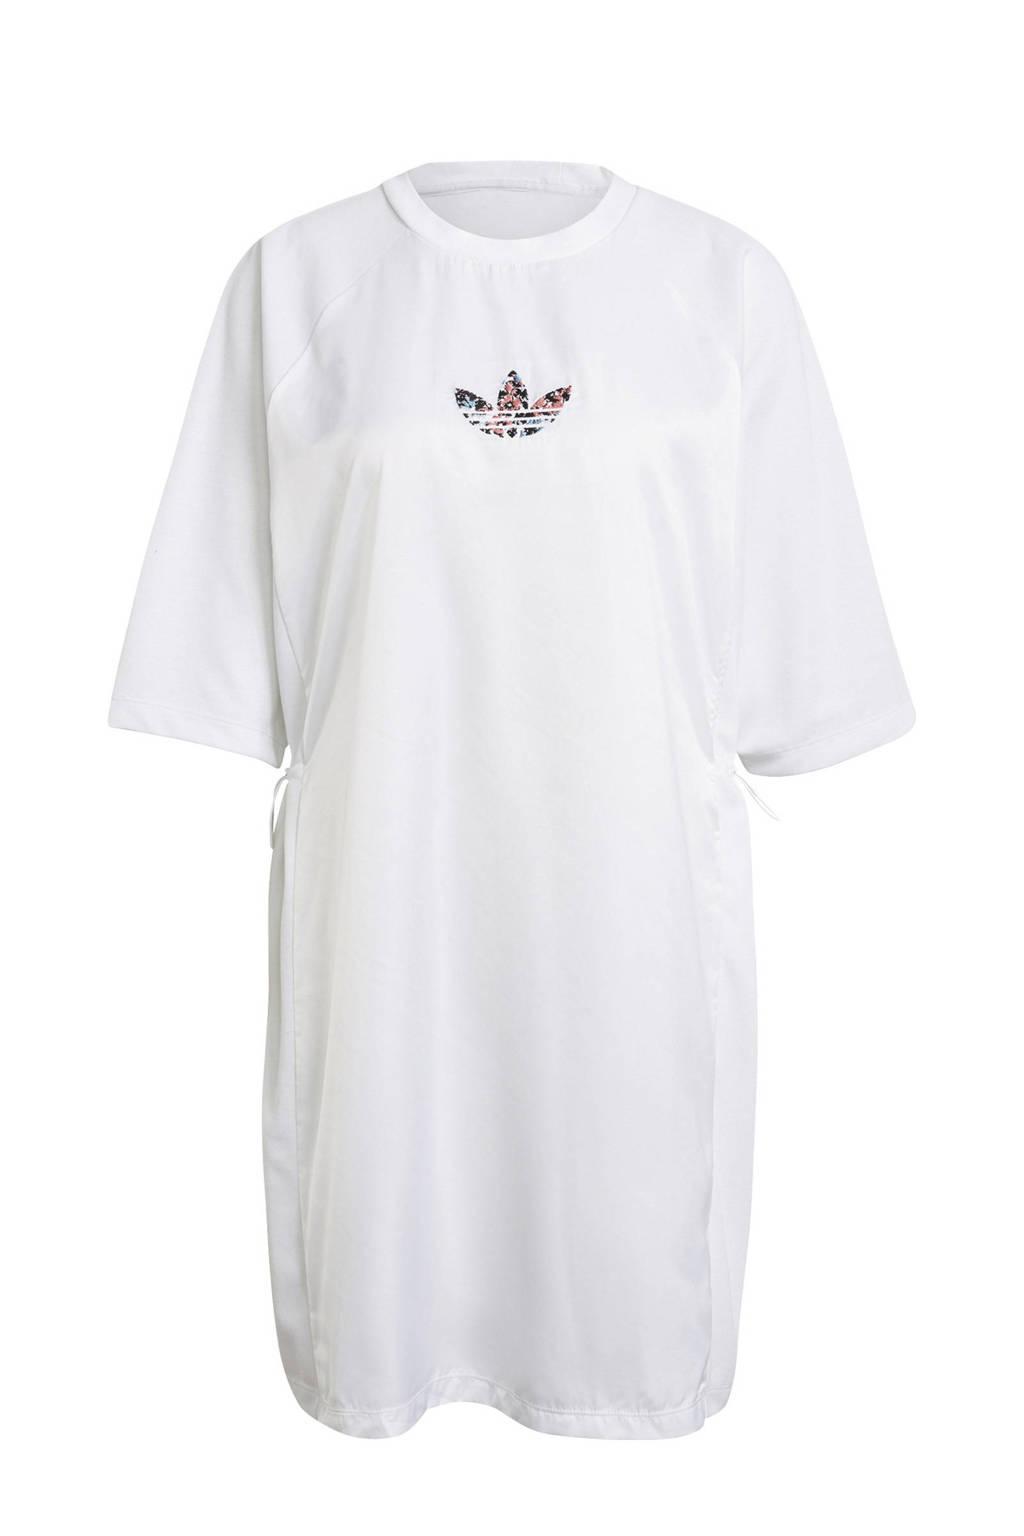 adidas Originals Adicolor T-shirt jurk wit, Wit